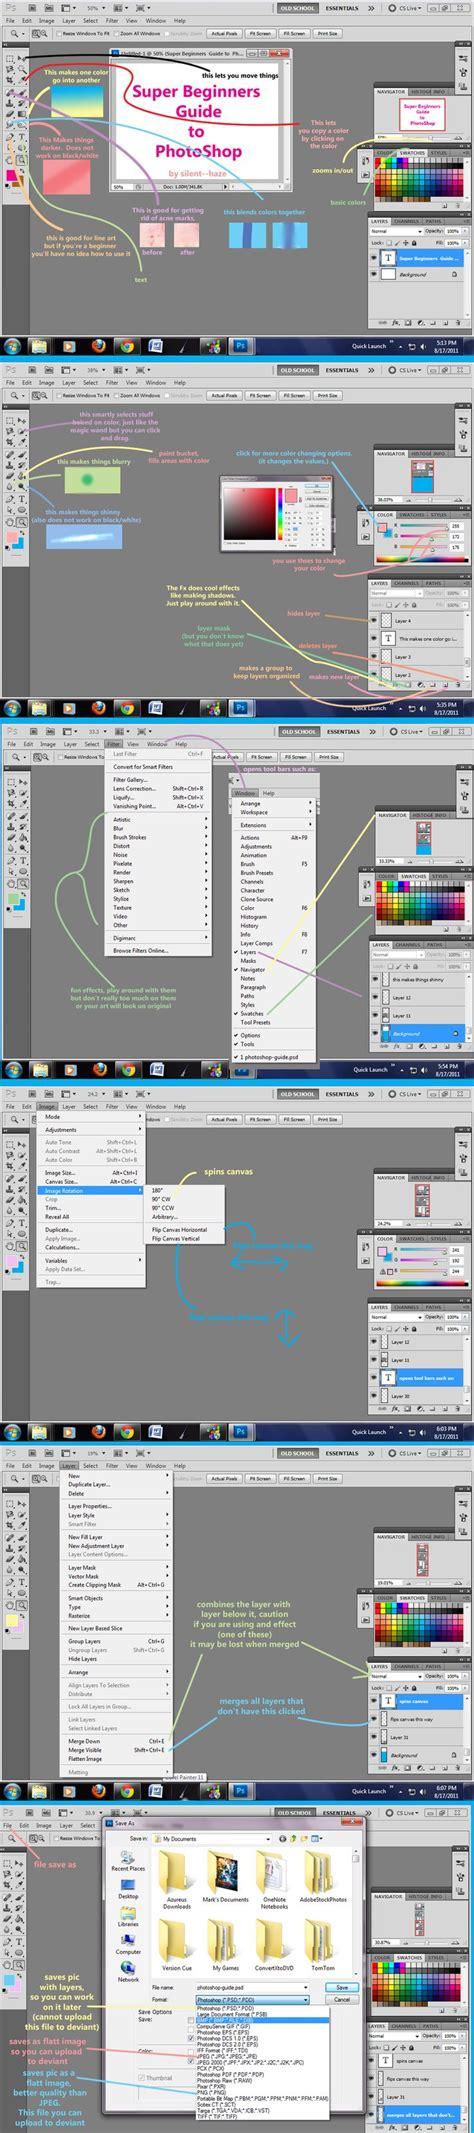 tutorial editing photo adobe photoshop best 25 adobe photoshop ideas on pinterest photoshop